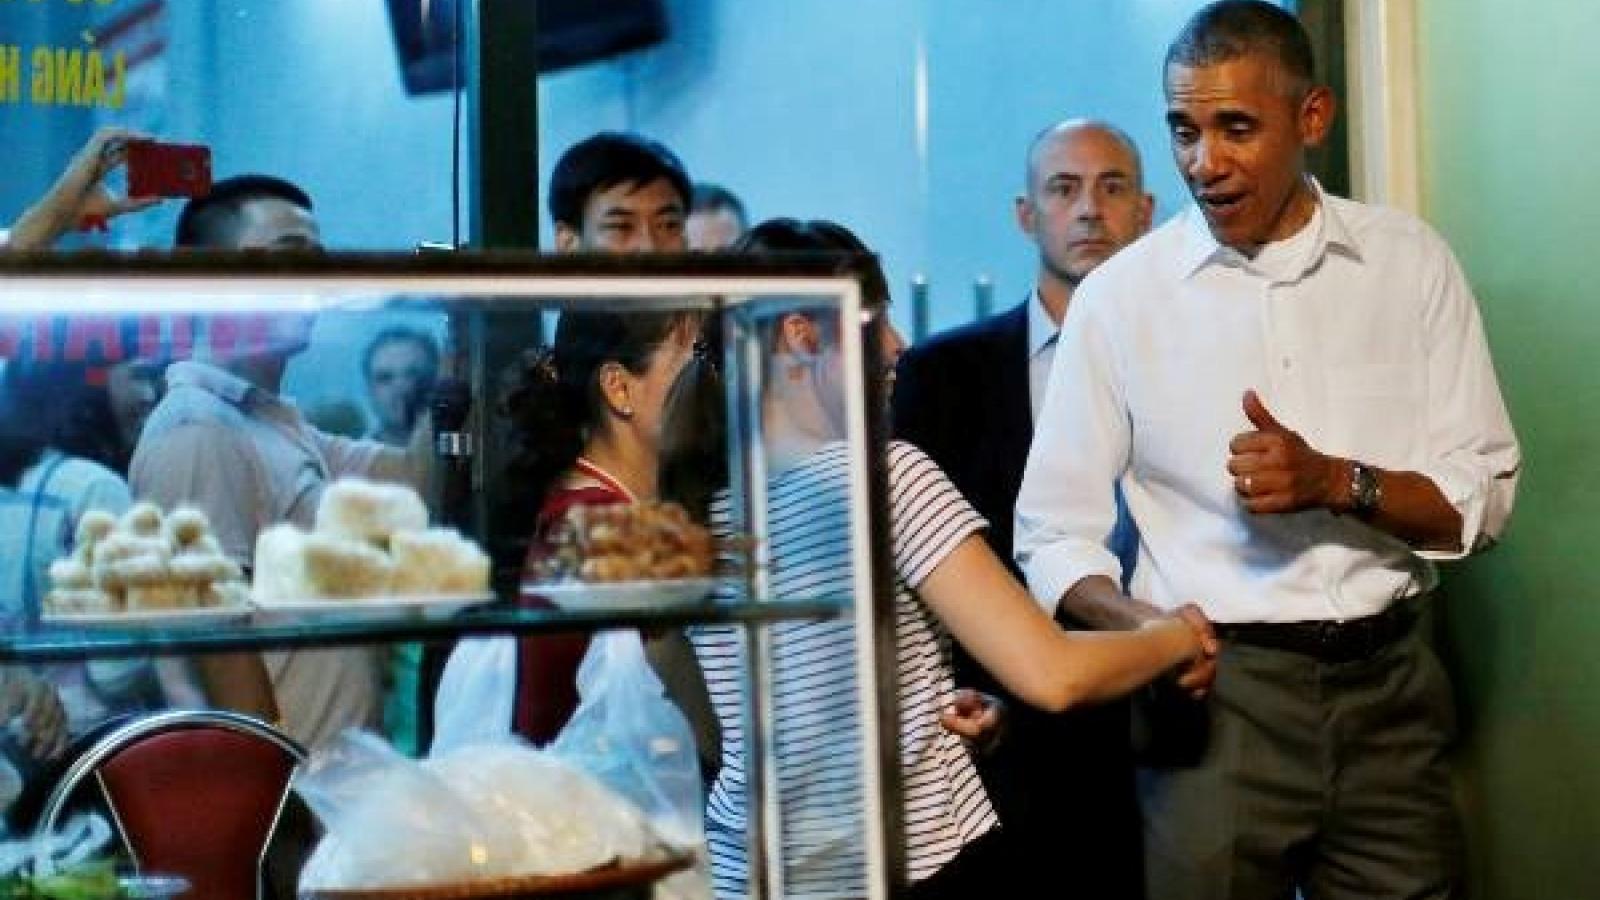 Obama hails 'Bun Cha' on CNN